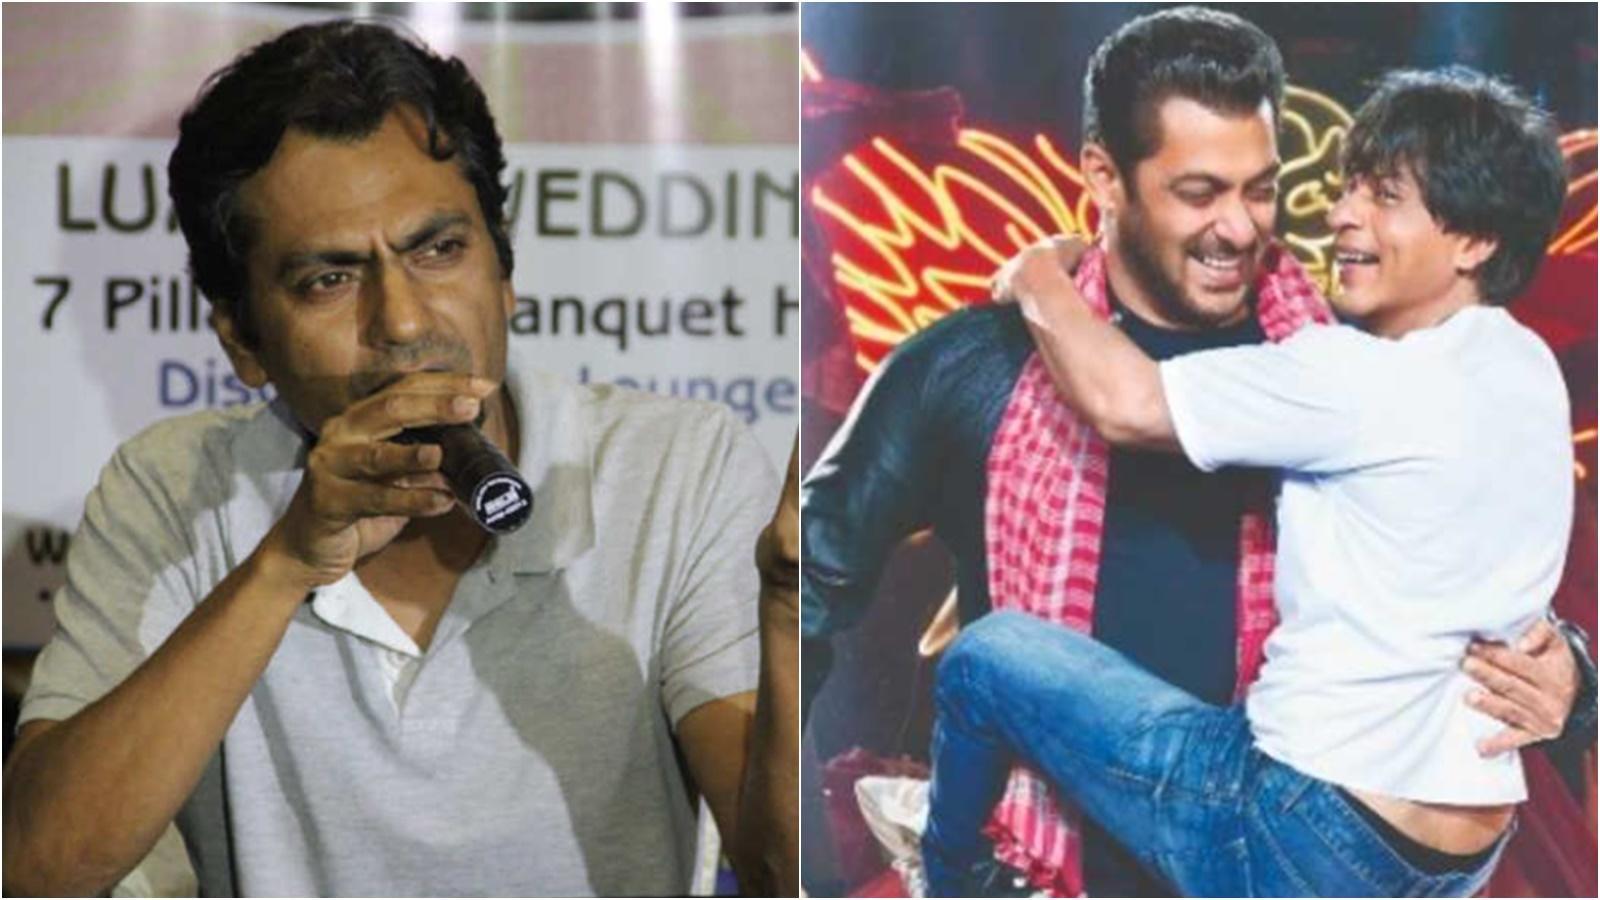 Nawazuddin Siddiqui's epic reply to fan's comment 'Sabhi Khans ko peeche chor diya aapne'!